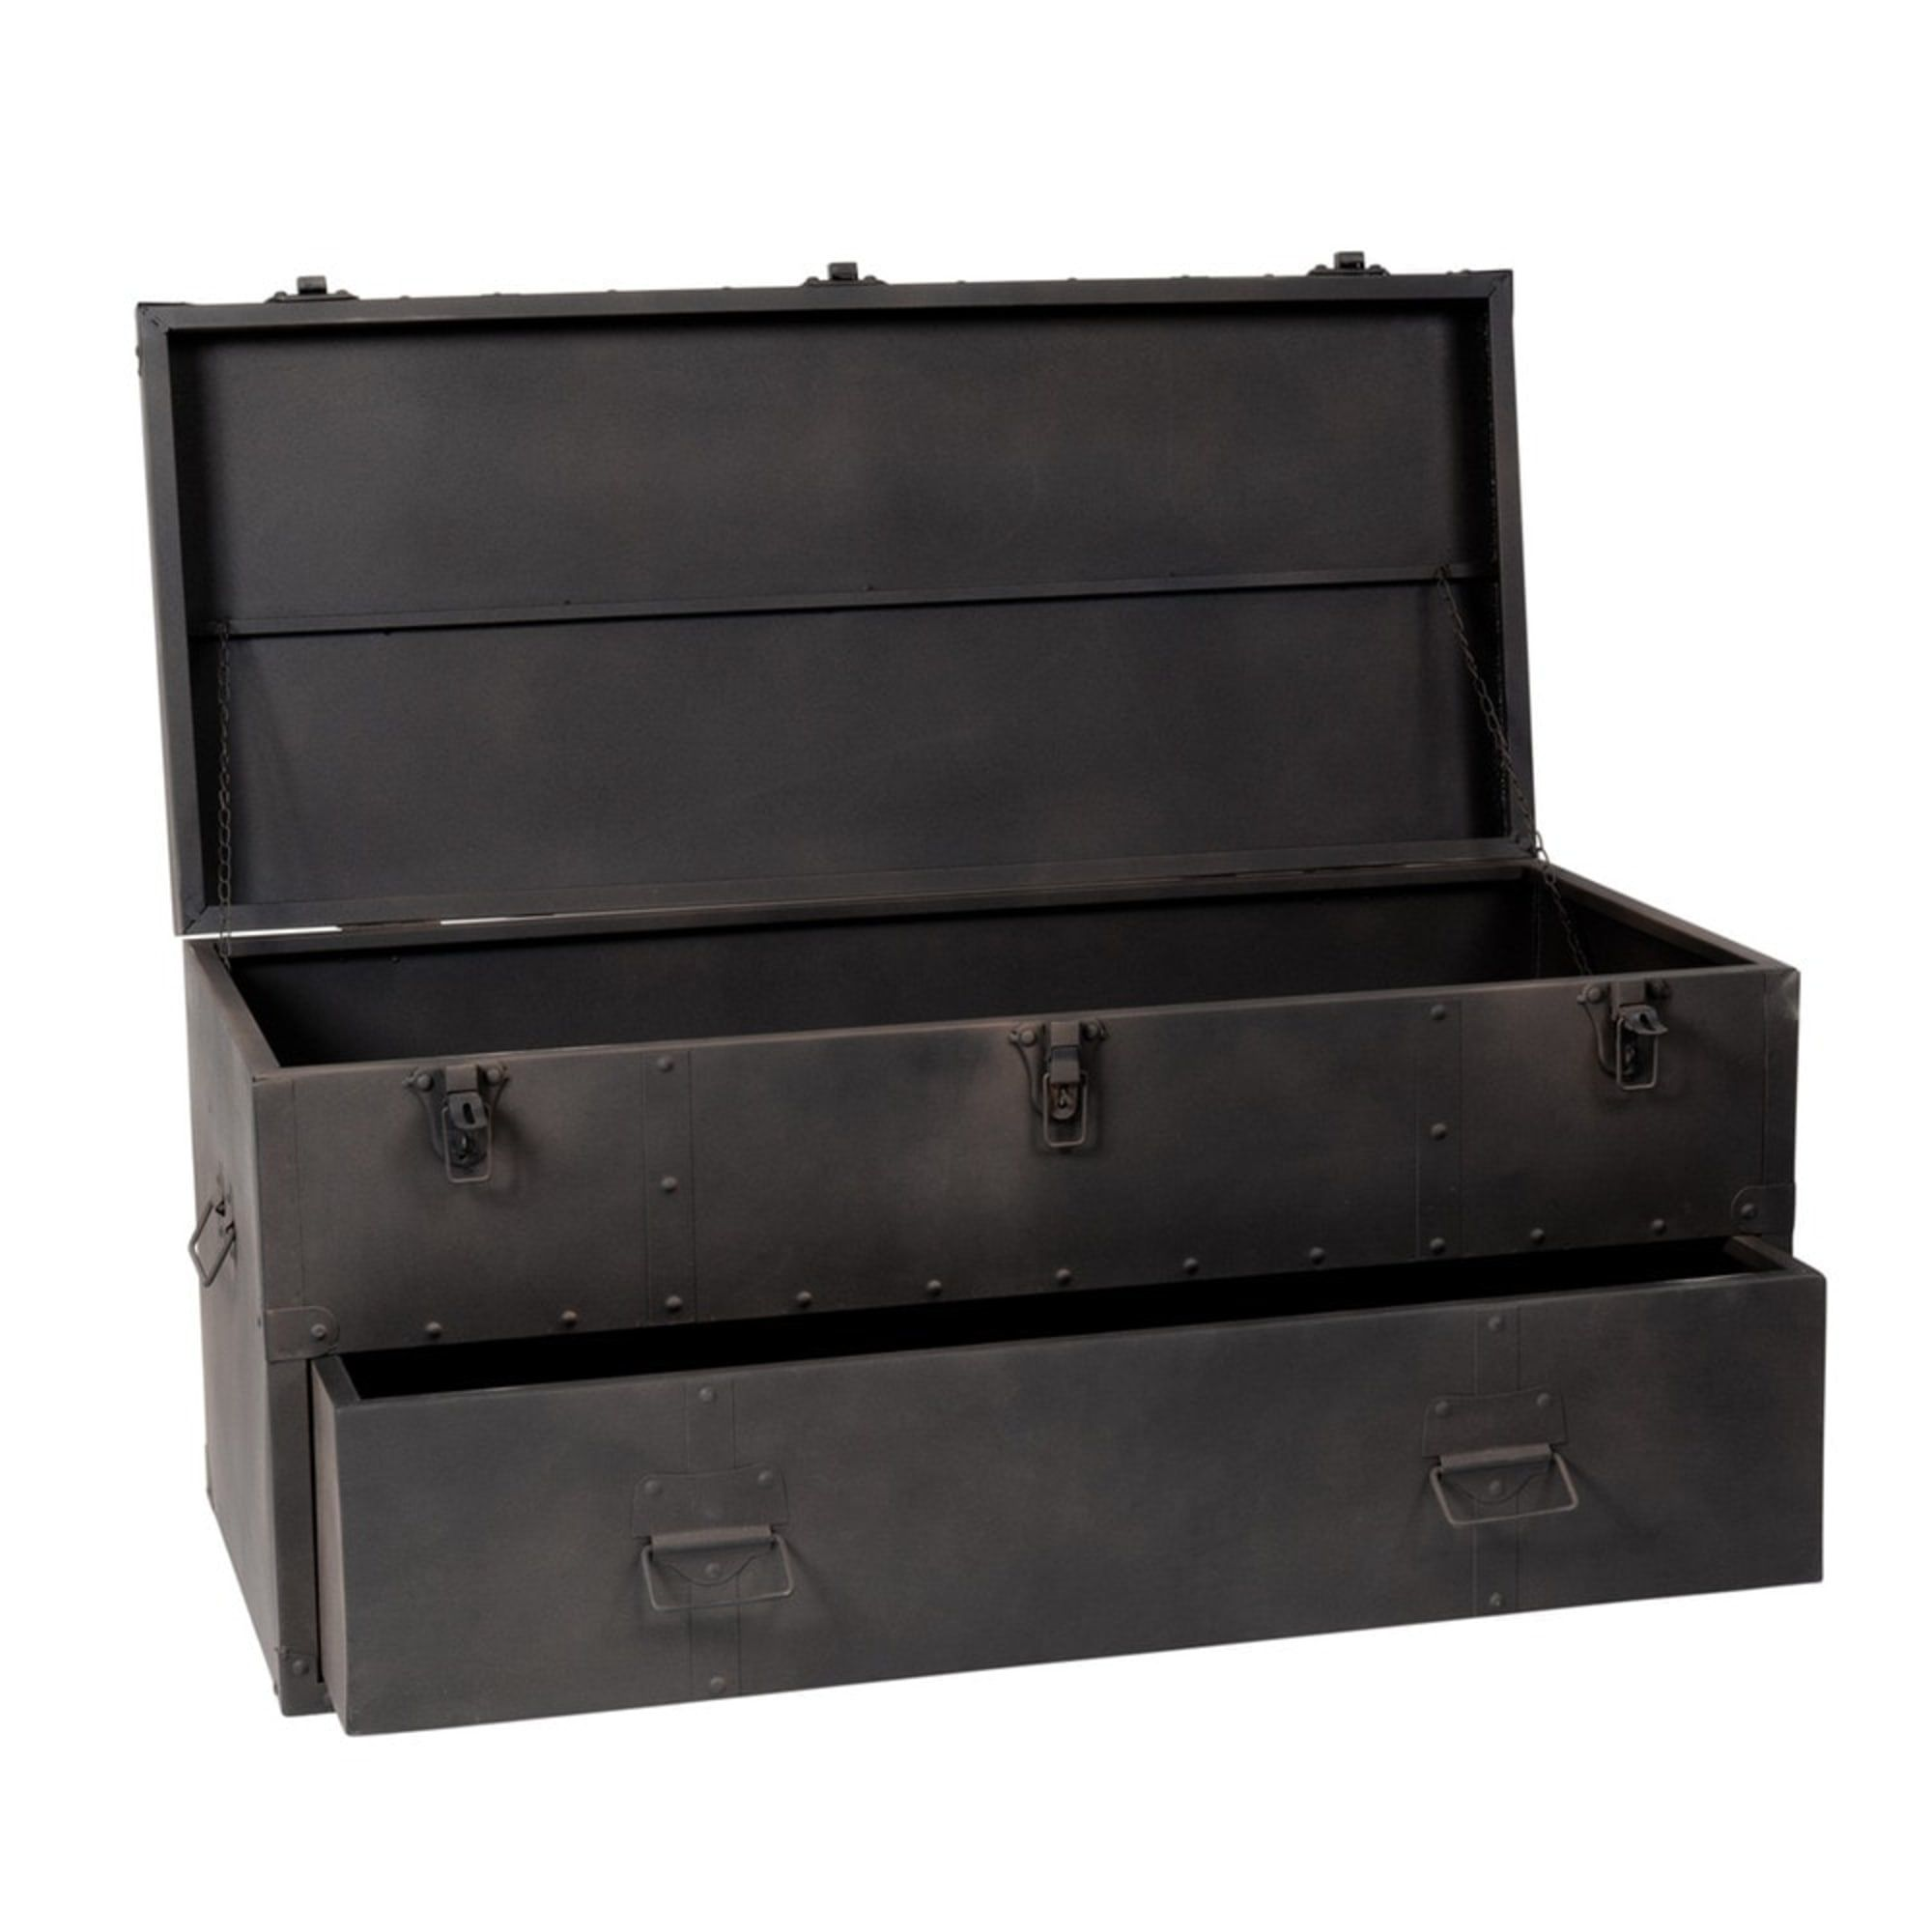 Metal Trunk In Charcoal Grey W 89cm Maisons Du Monde Malle En Metal Malle Metallique Malle De Rangement